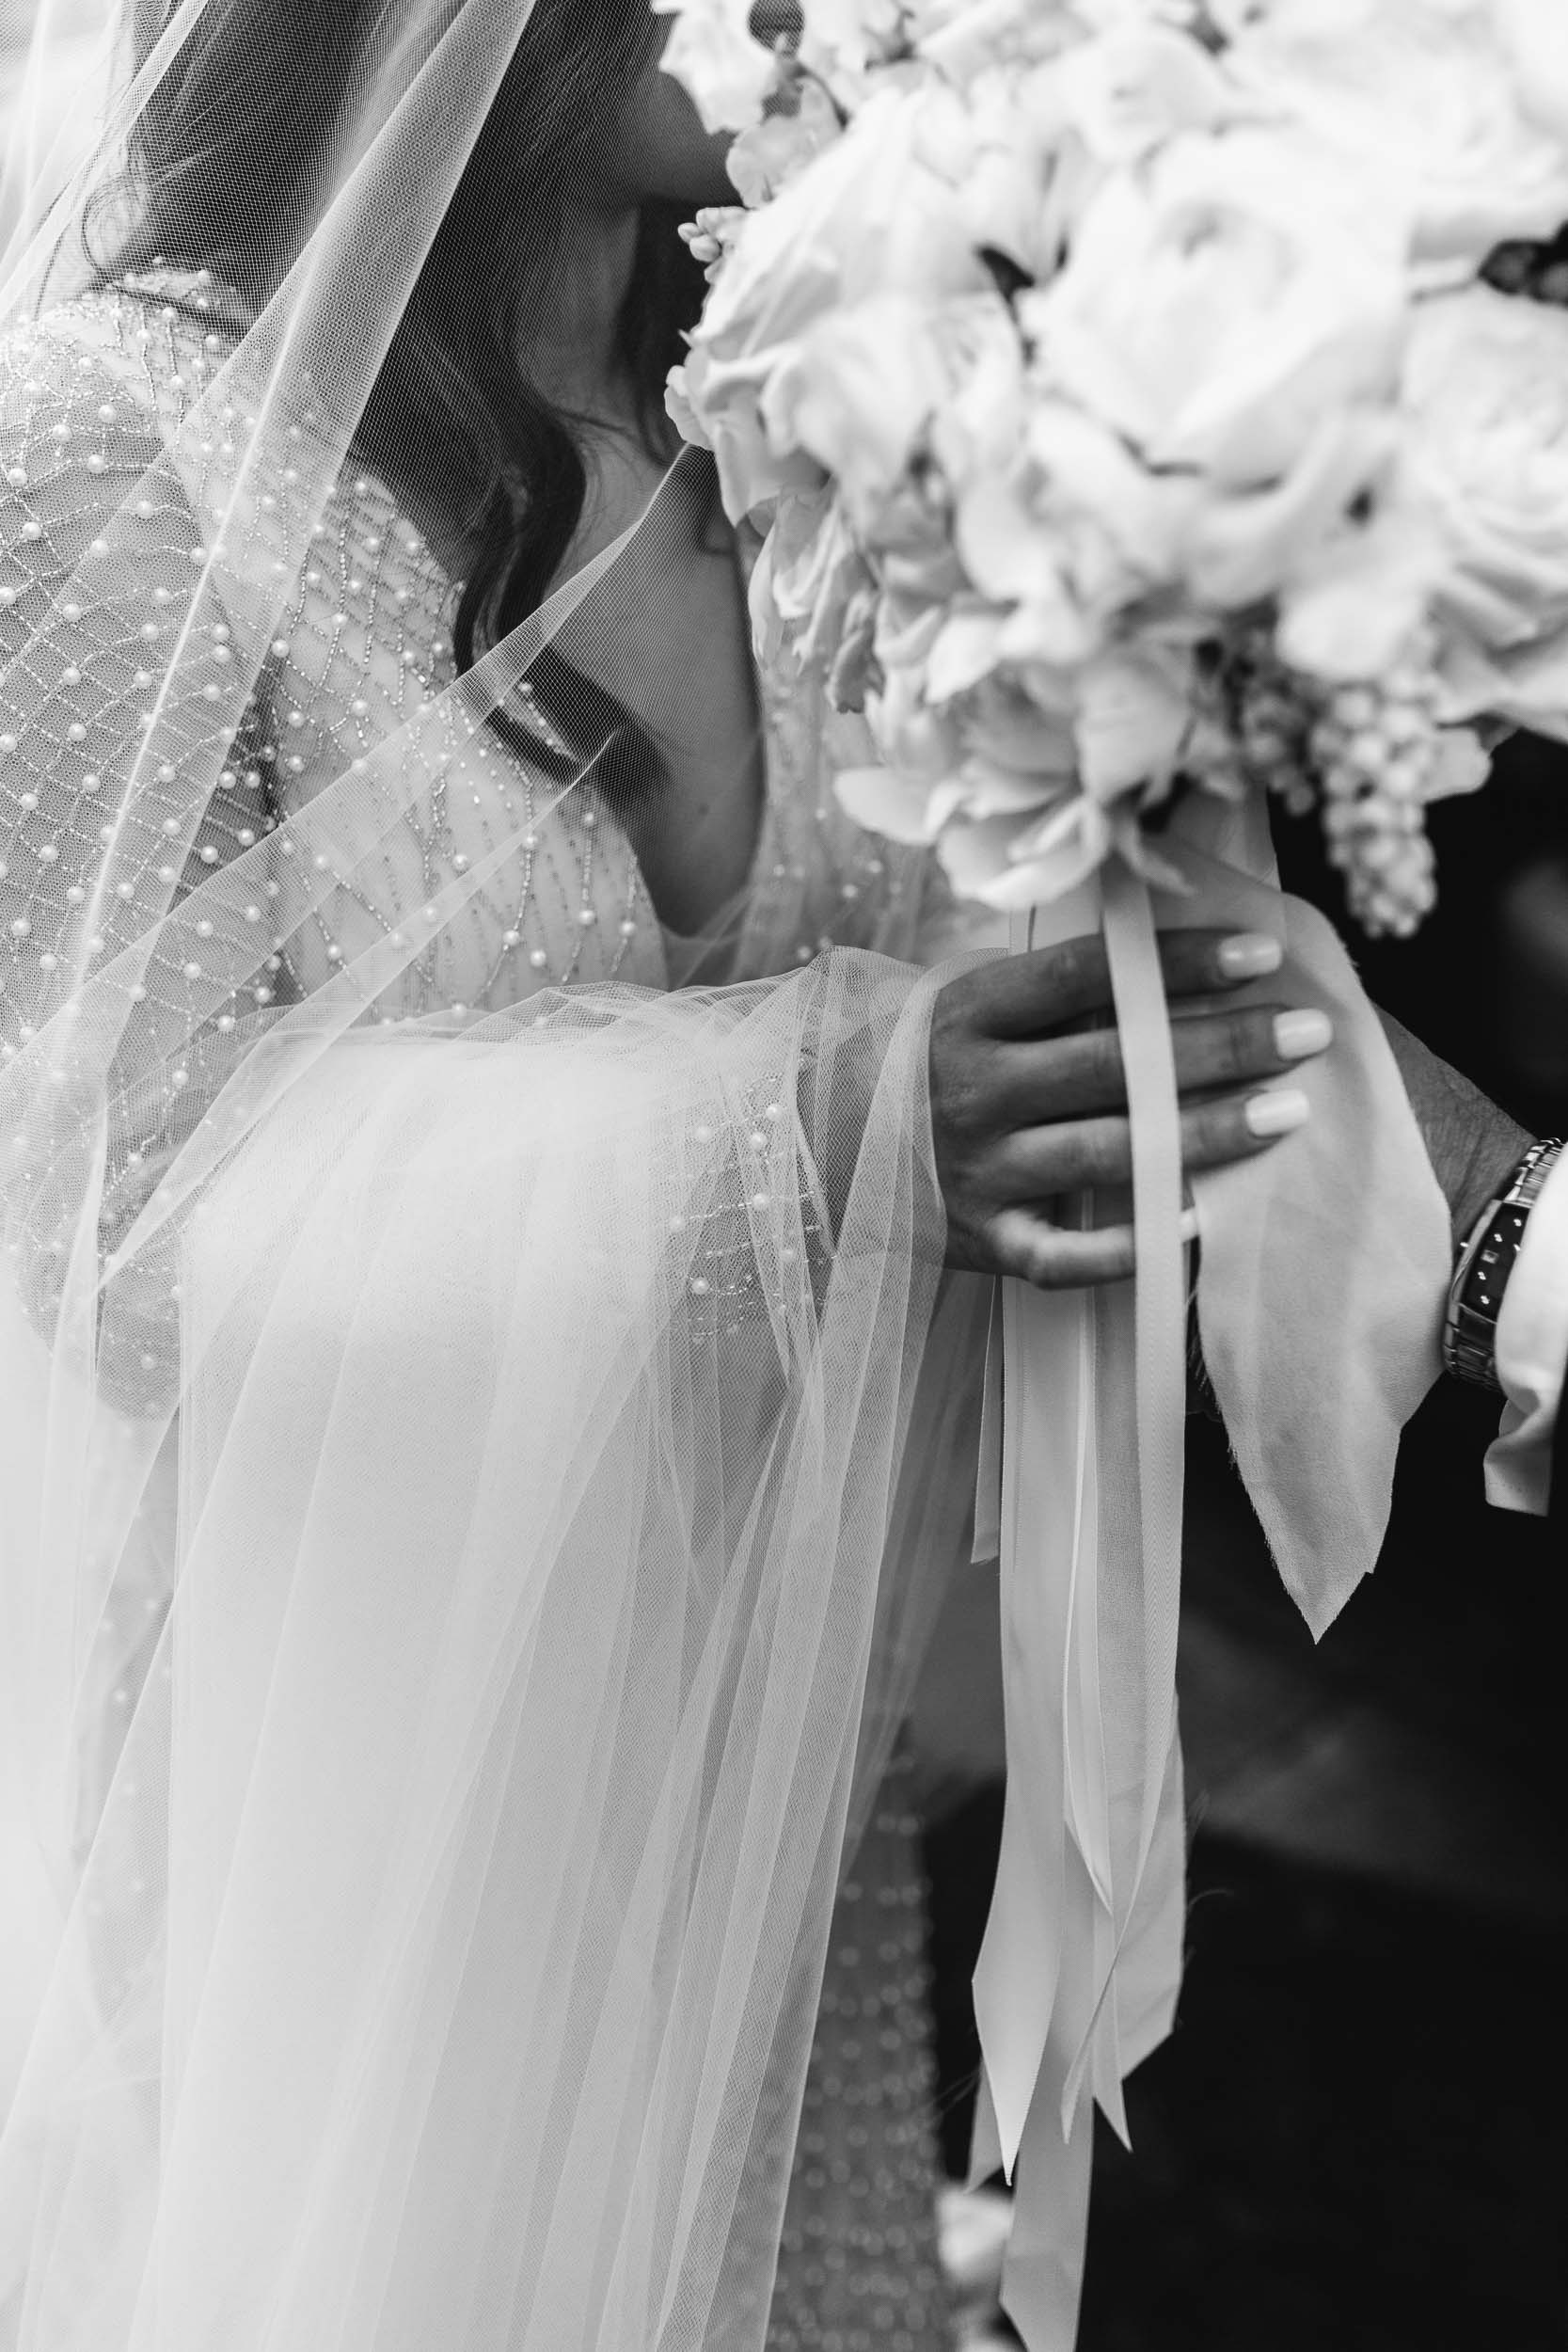 Kas-Richards-Wedding-Photographer-Melbourne-City-Wedding-Alto-Event-Space-Jane-Hill-Bridal-Gown-24.jpg